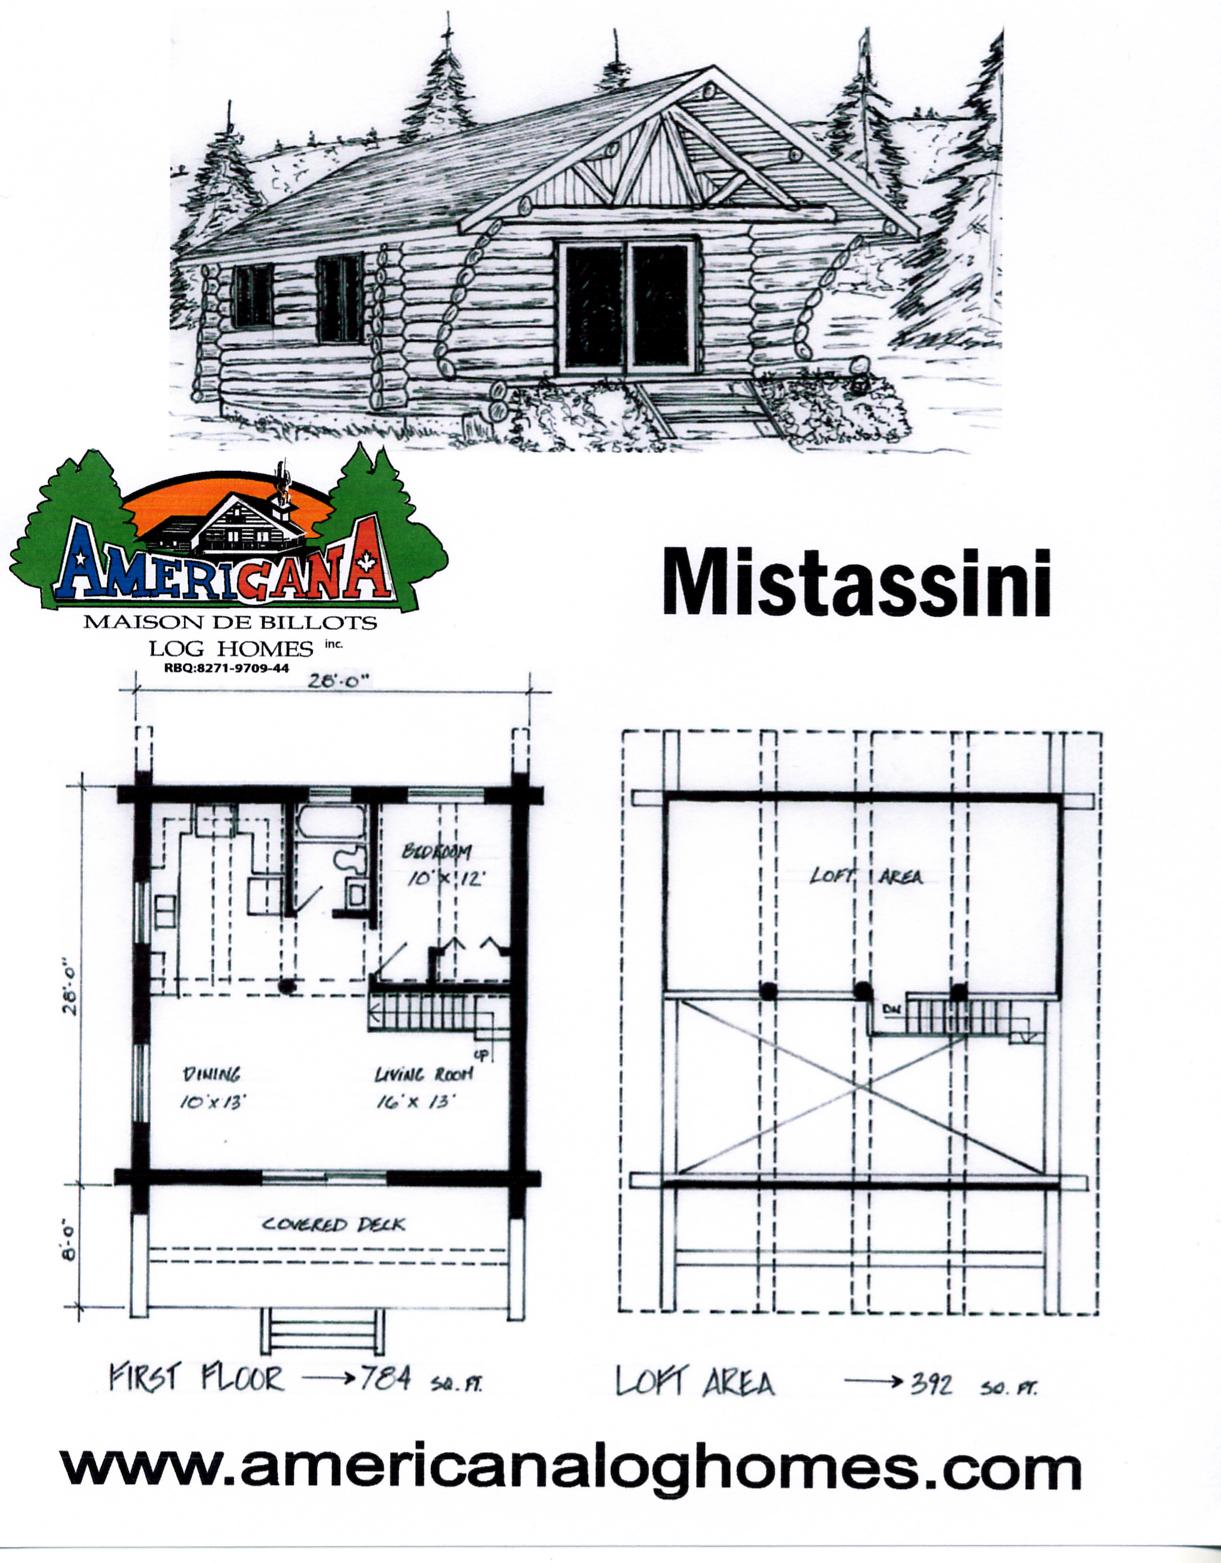 Mistassini americana log homes for Americana homes